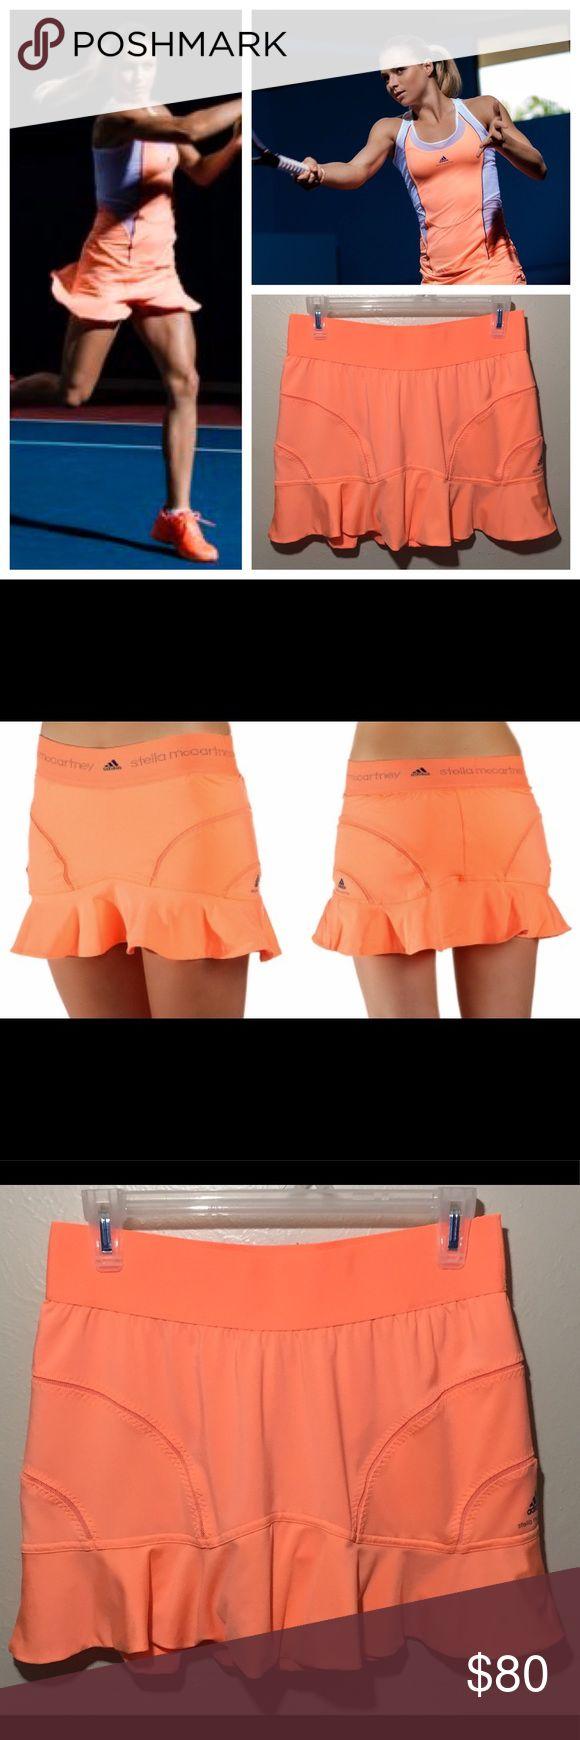 "Stella McCartney Adidas Barricade Skirt Skort Stella McCartney Adidas Barricade Bright Coral Tennis Skirt Skort.  Please view last photo for minor elastic stretch.  MEASUREMENTS: ACROSS WAIST: 14"" TOTAL LENGTH: 14"" Adidas by Stella McCartney Skirts"